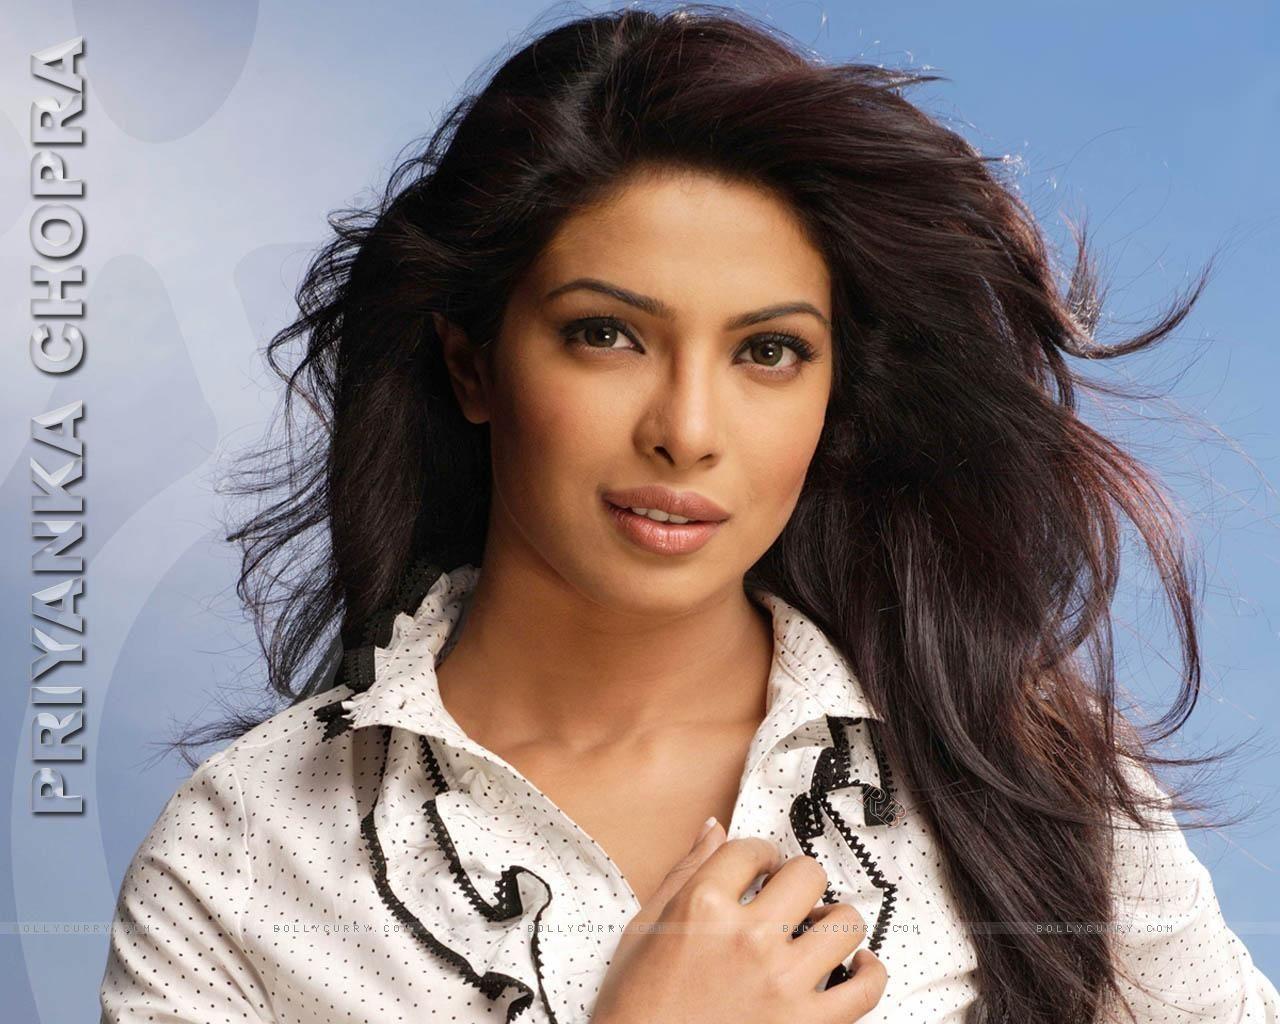 download free hd wallpapers of priyanka chopra | priyanka chopra